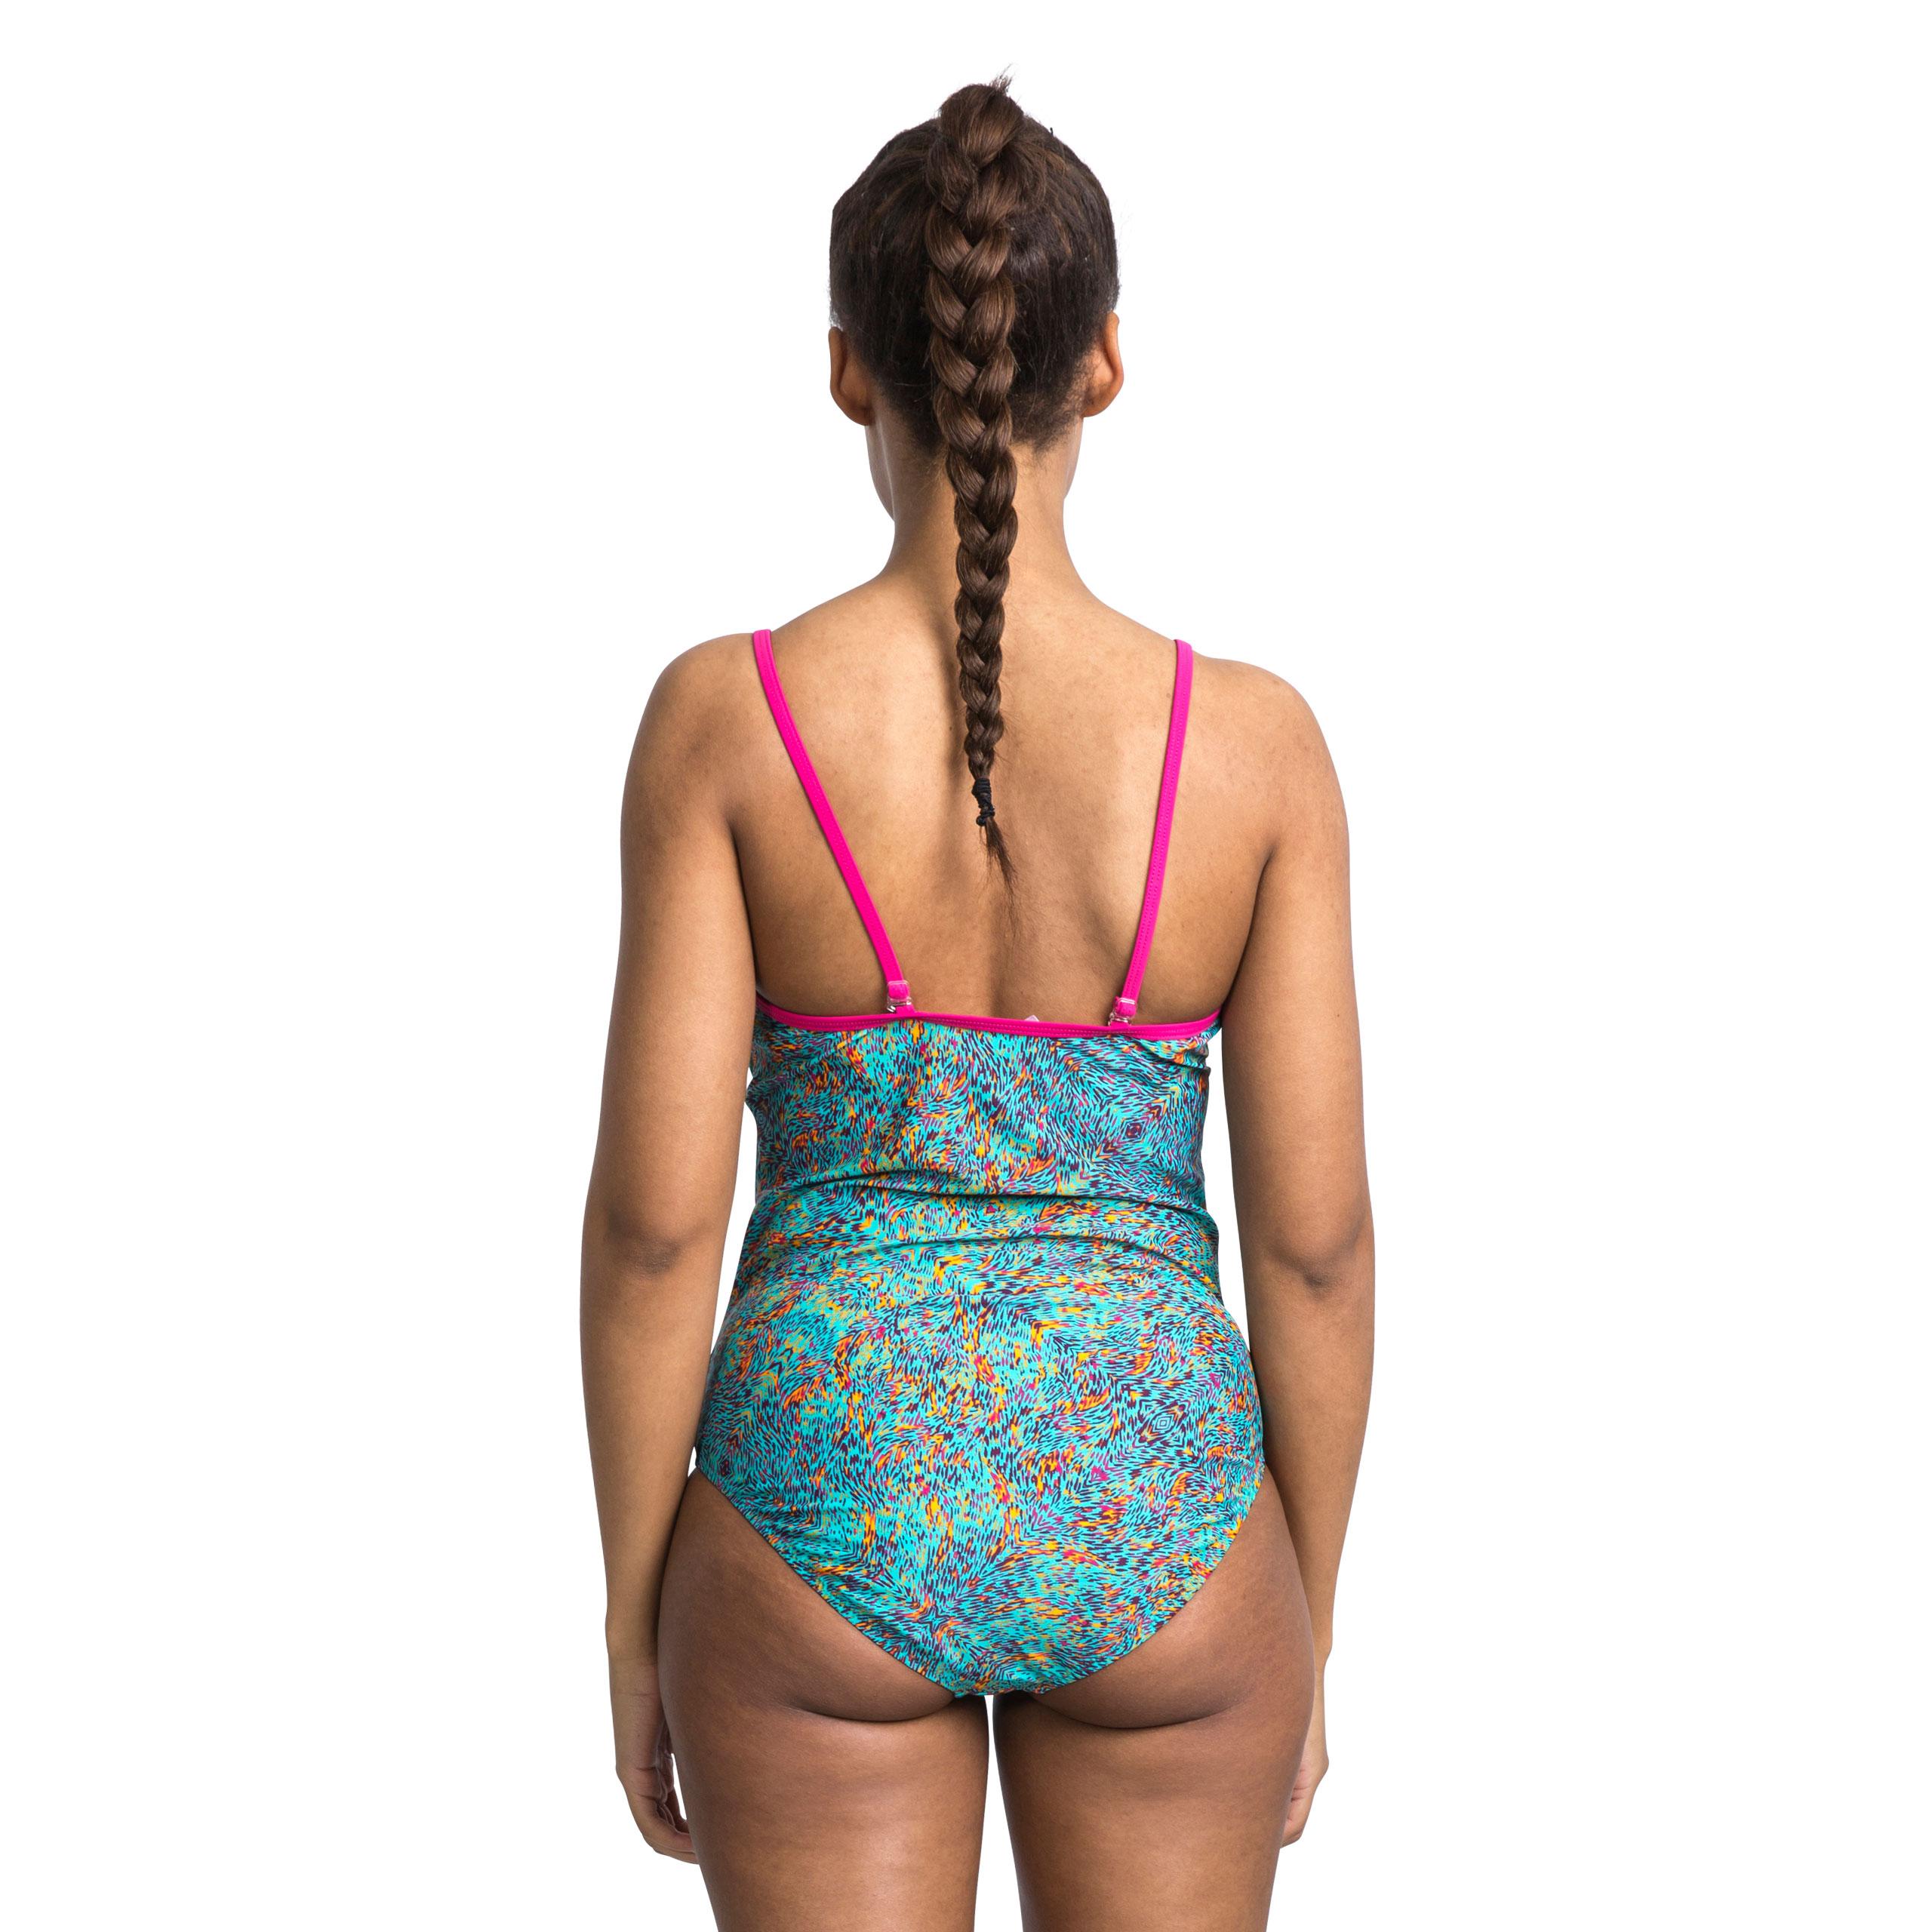 Trespass-Lotty-Womens-One-Piece-Swimsuit-Padded-Swimwear thumbnail 13